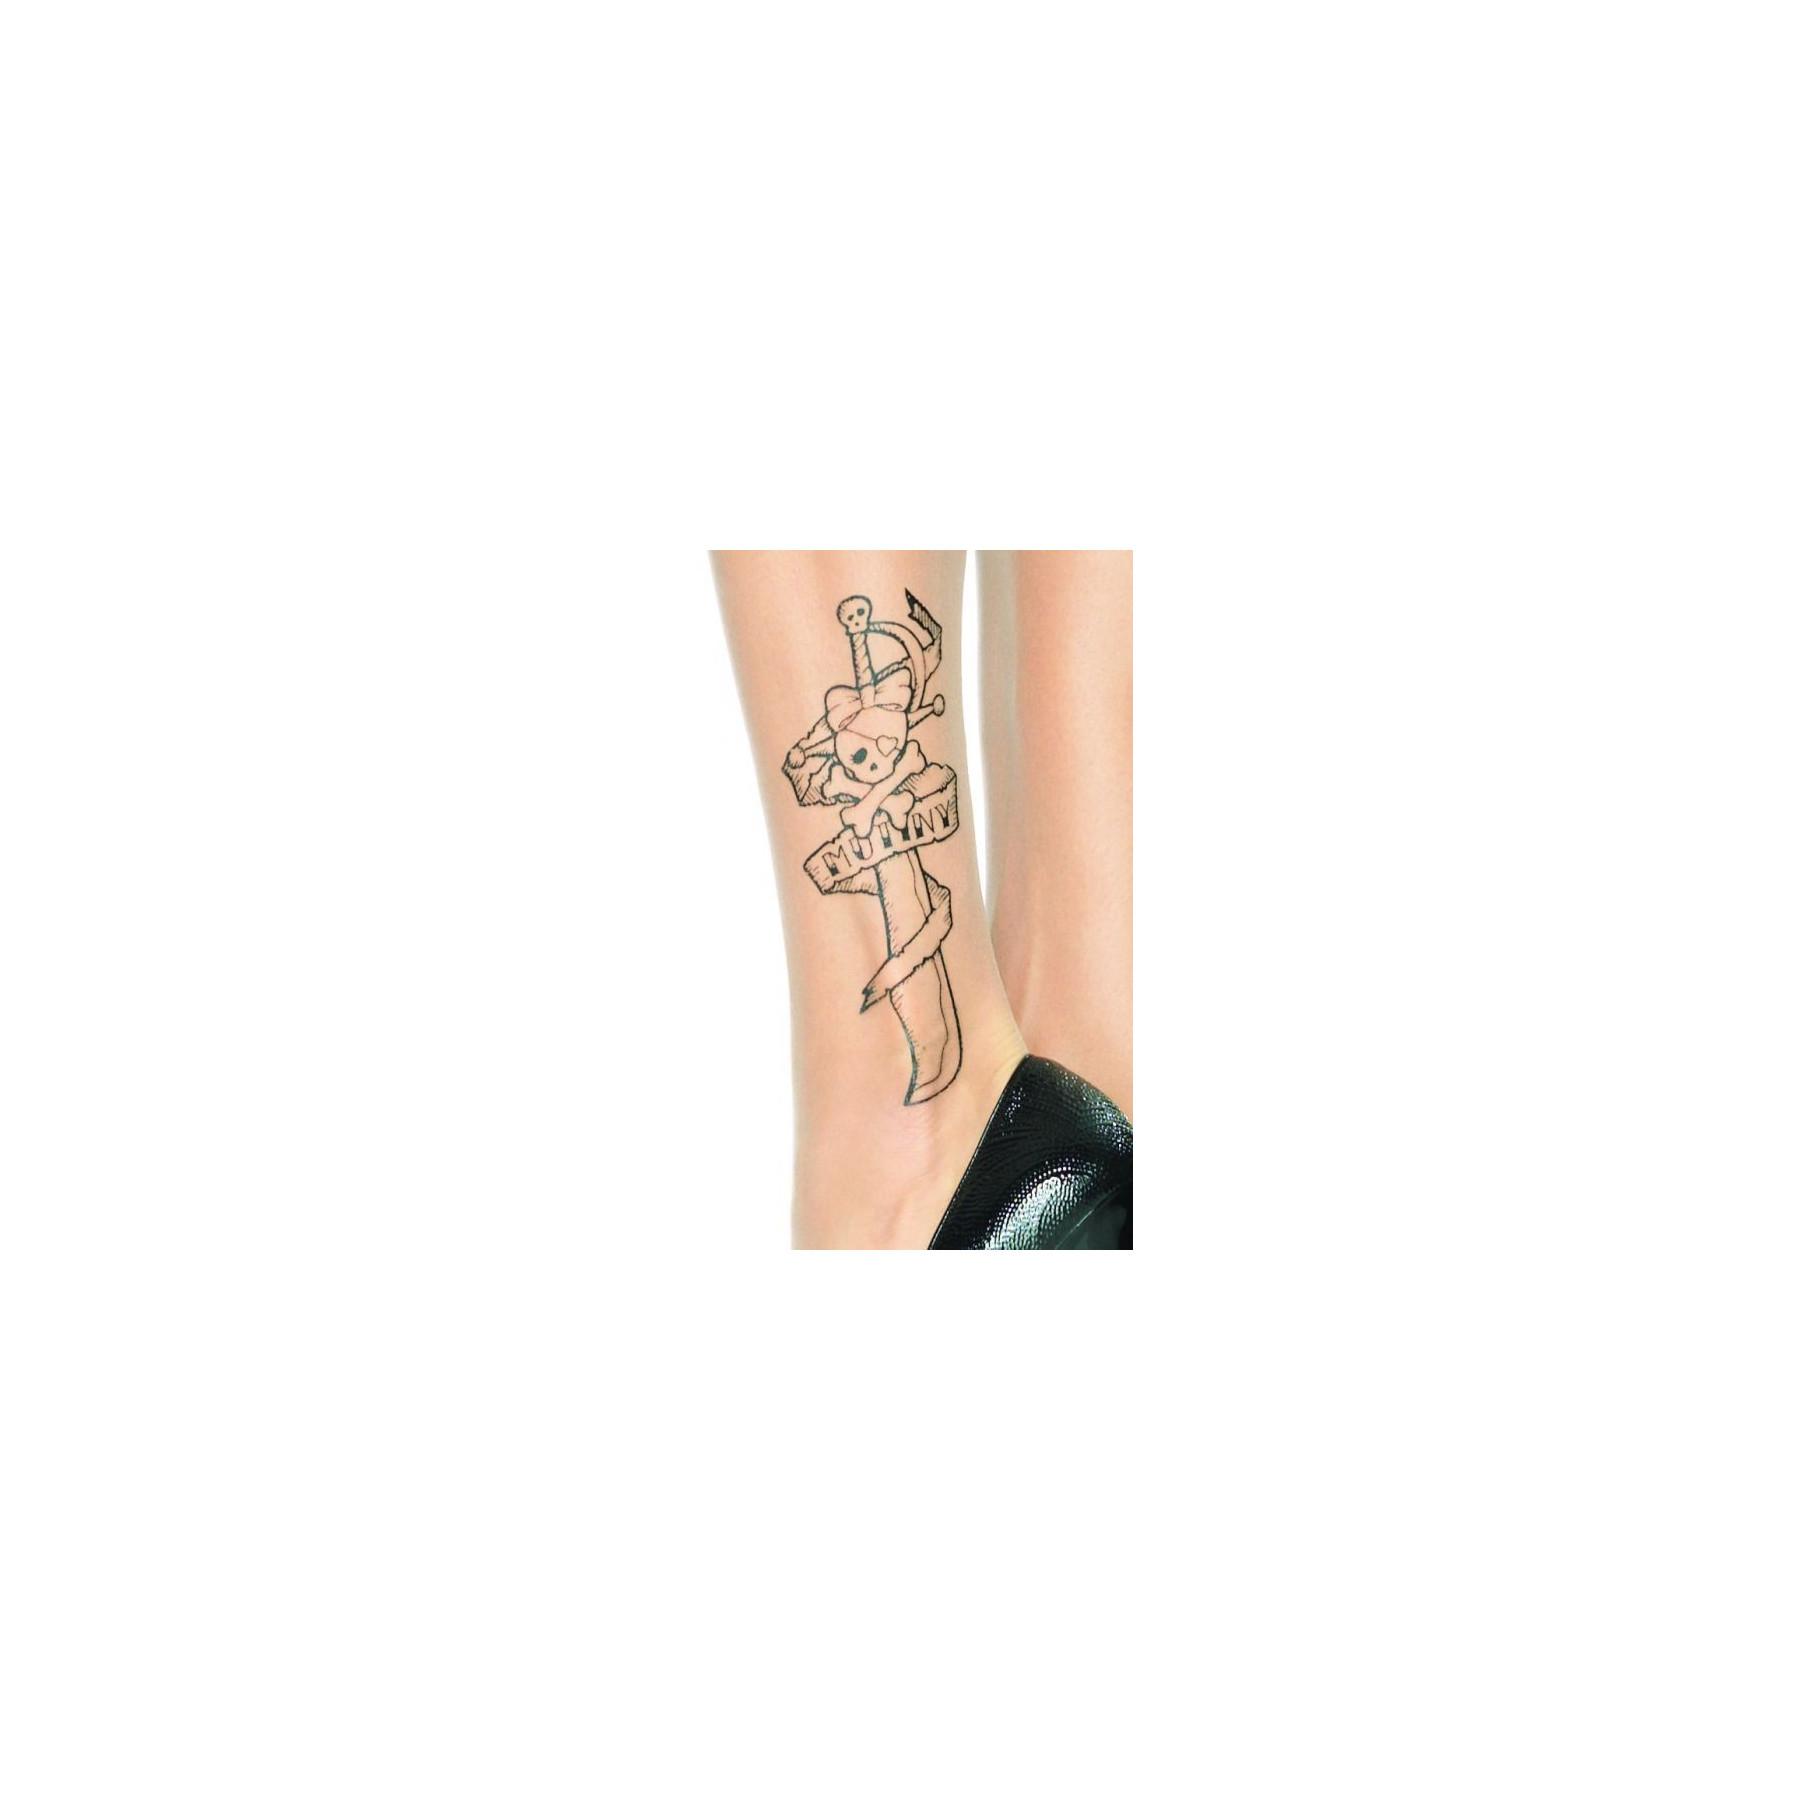 Collant tattoo velati stampa teschio pirata leg avenue